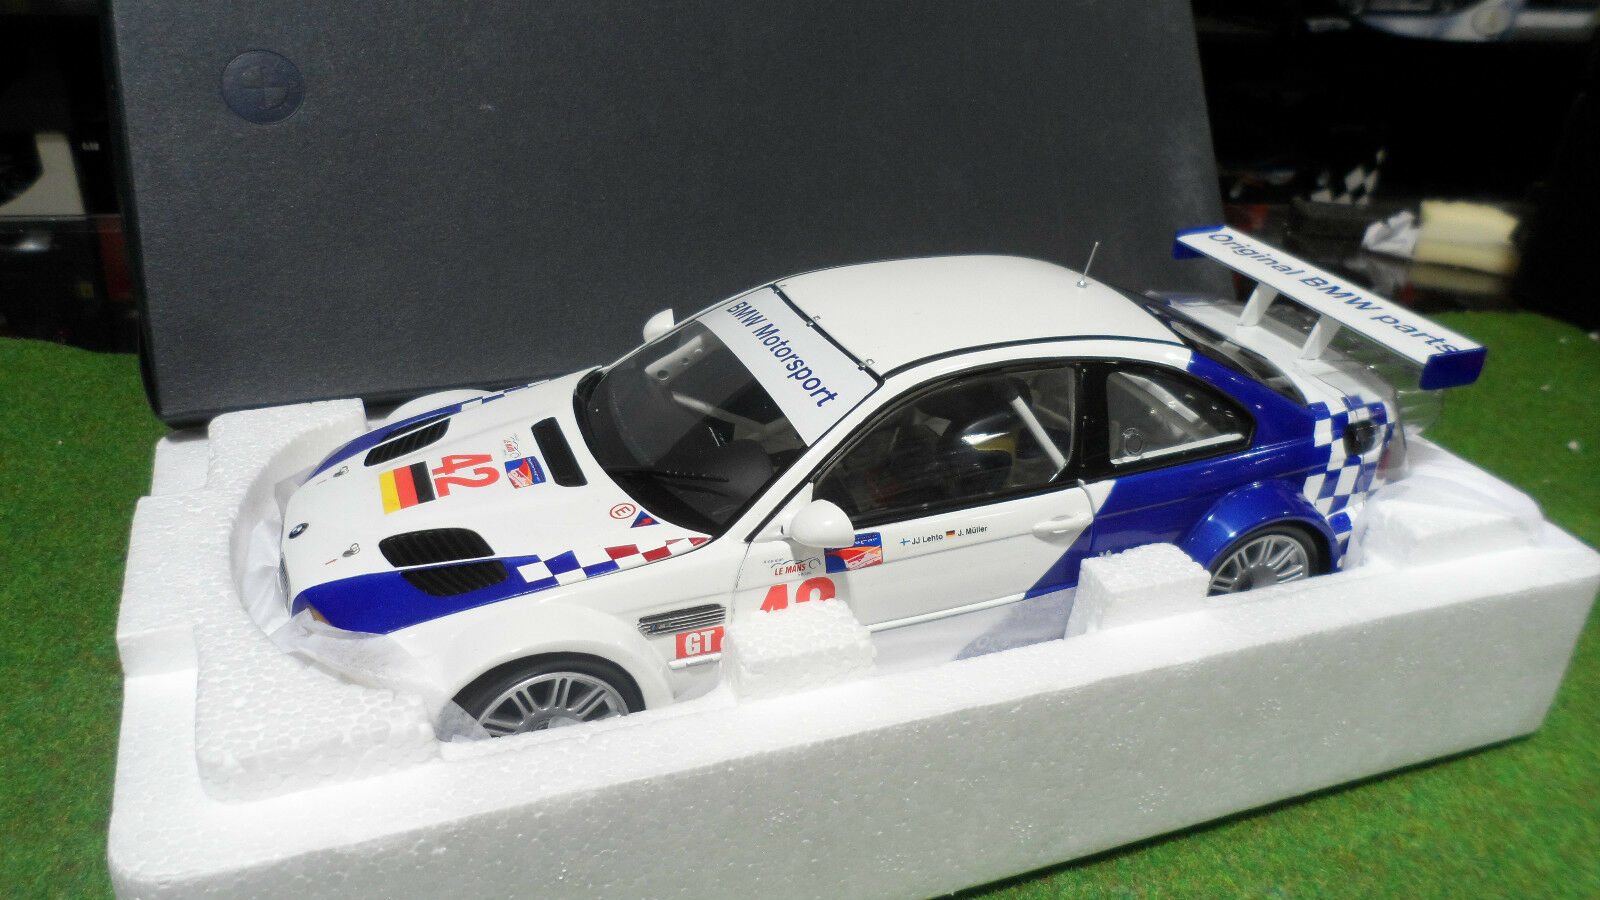 BMW  M3 GTR 2001 LEHTO   42 MÜLLER 1 18 MINICHAMPS 80430139183 voiture miniature